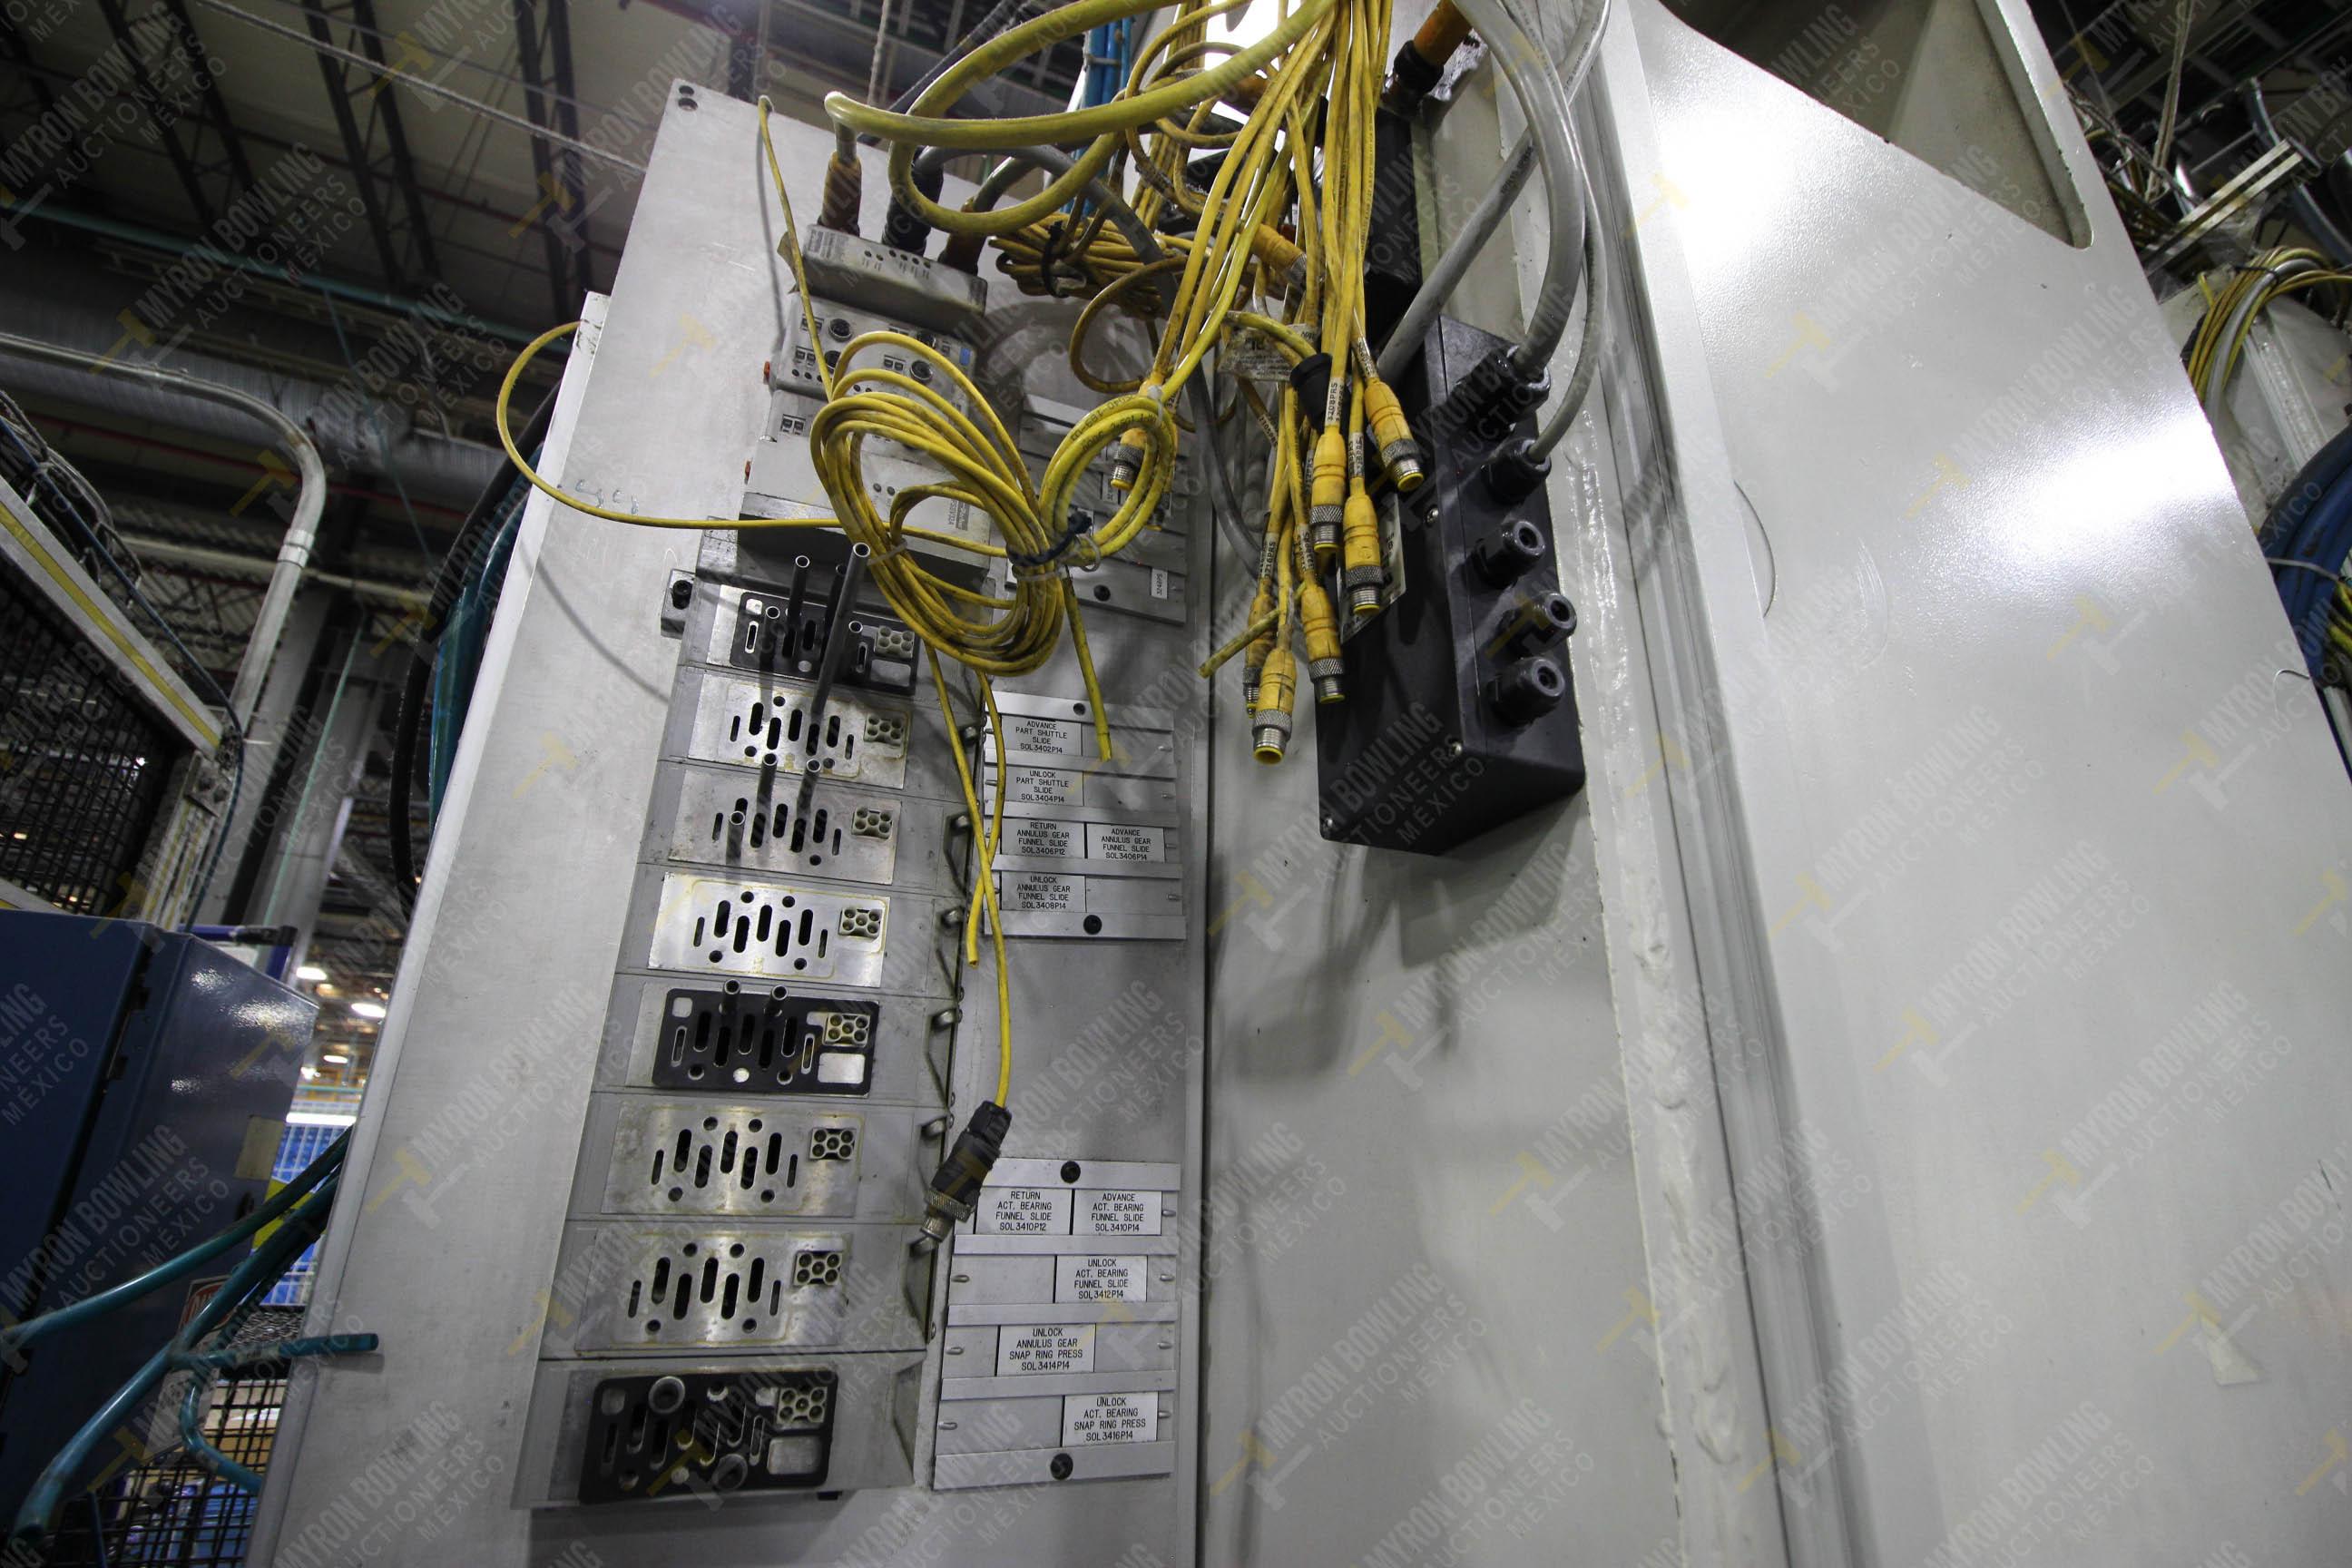 Estación semiautomática para operación 305D, contiene: Prensa tipo cuello de ganso con dos cilindros - Image 12 of 20